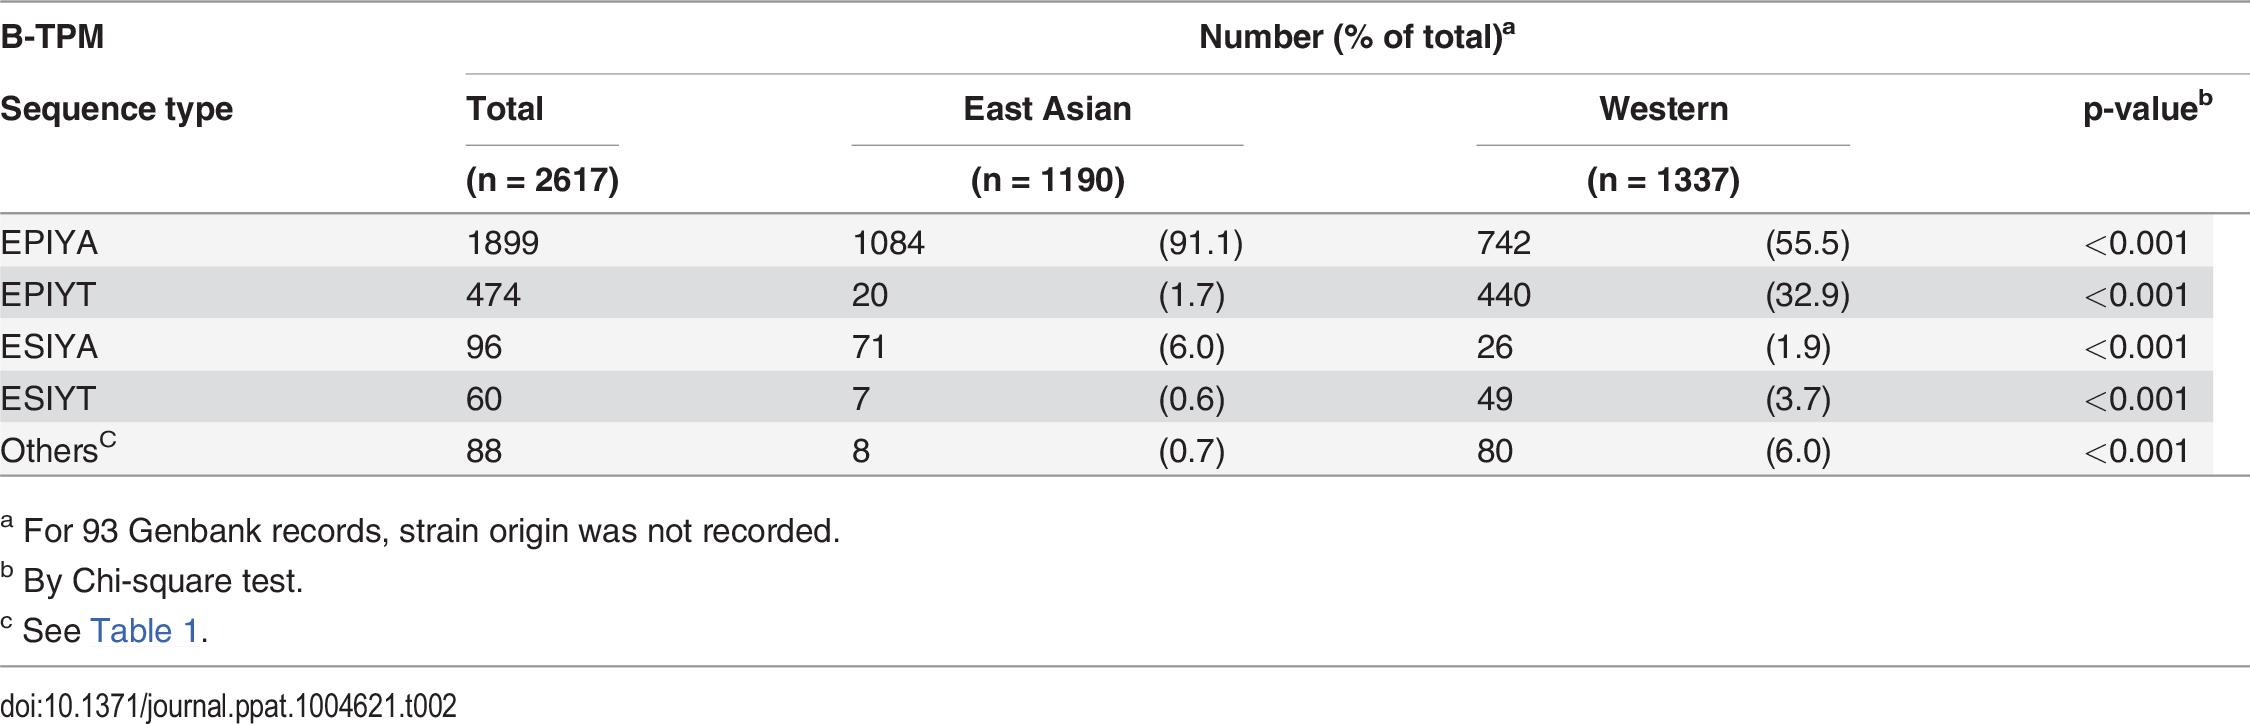 Distribution of alternative TPMs in 2617 CagA B-TPMs, by <i>H. pylori</i> geographic origin.